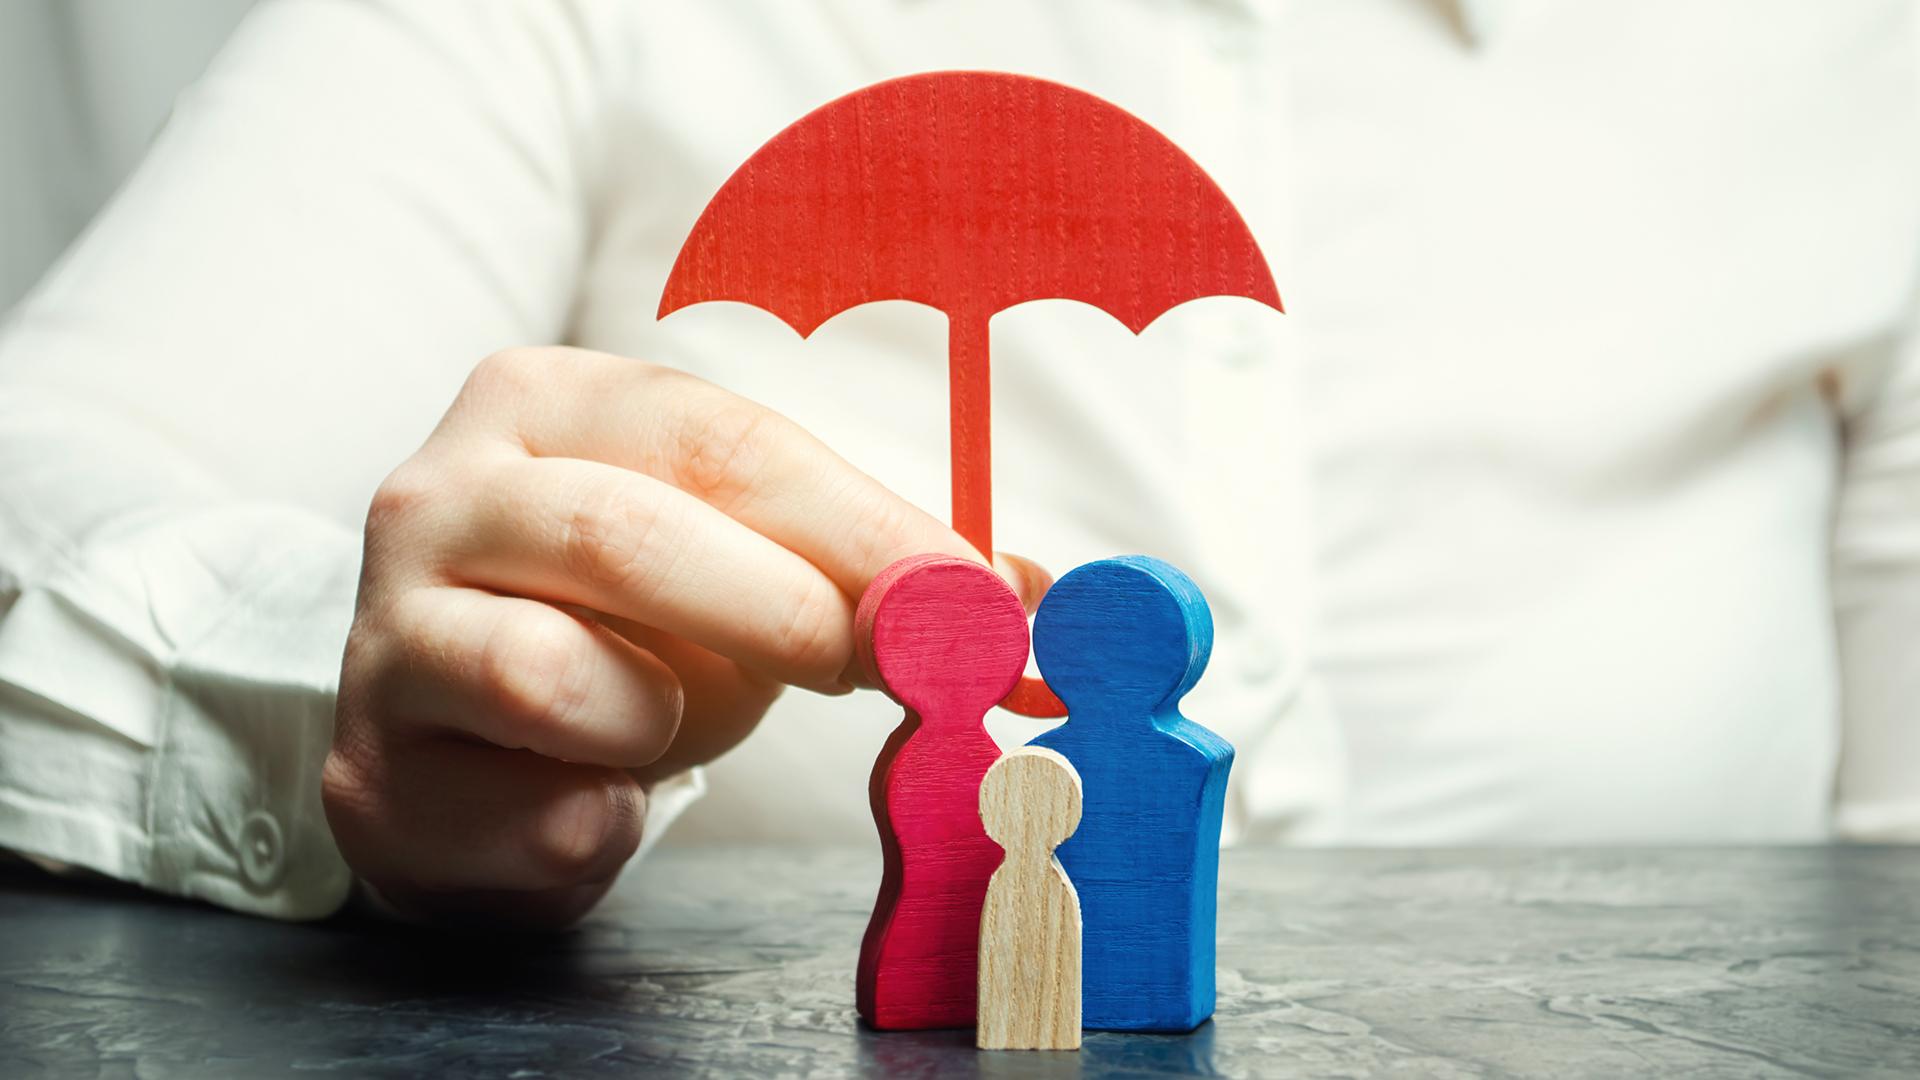 Wooden block family under umbrella